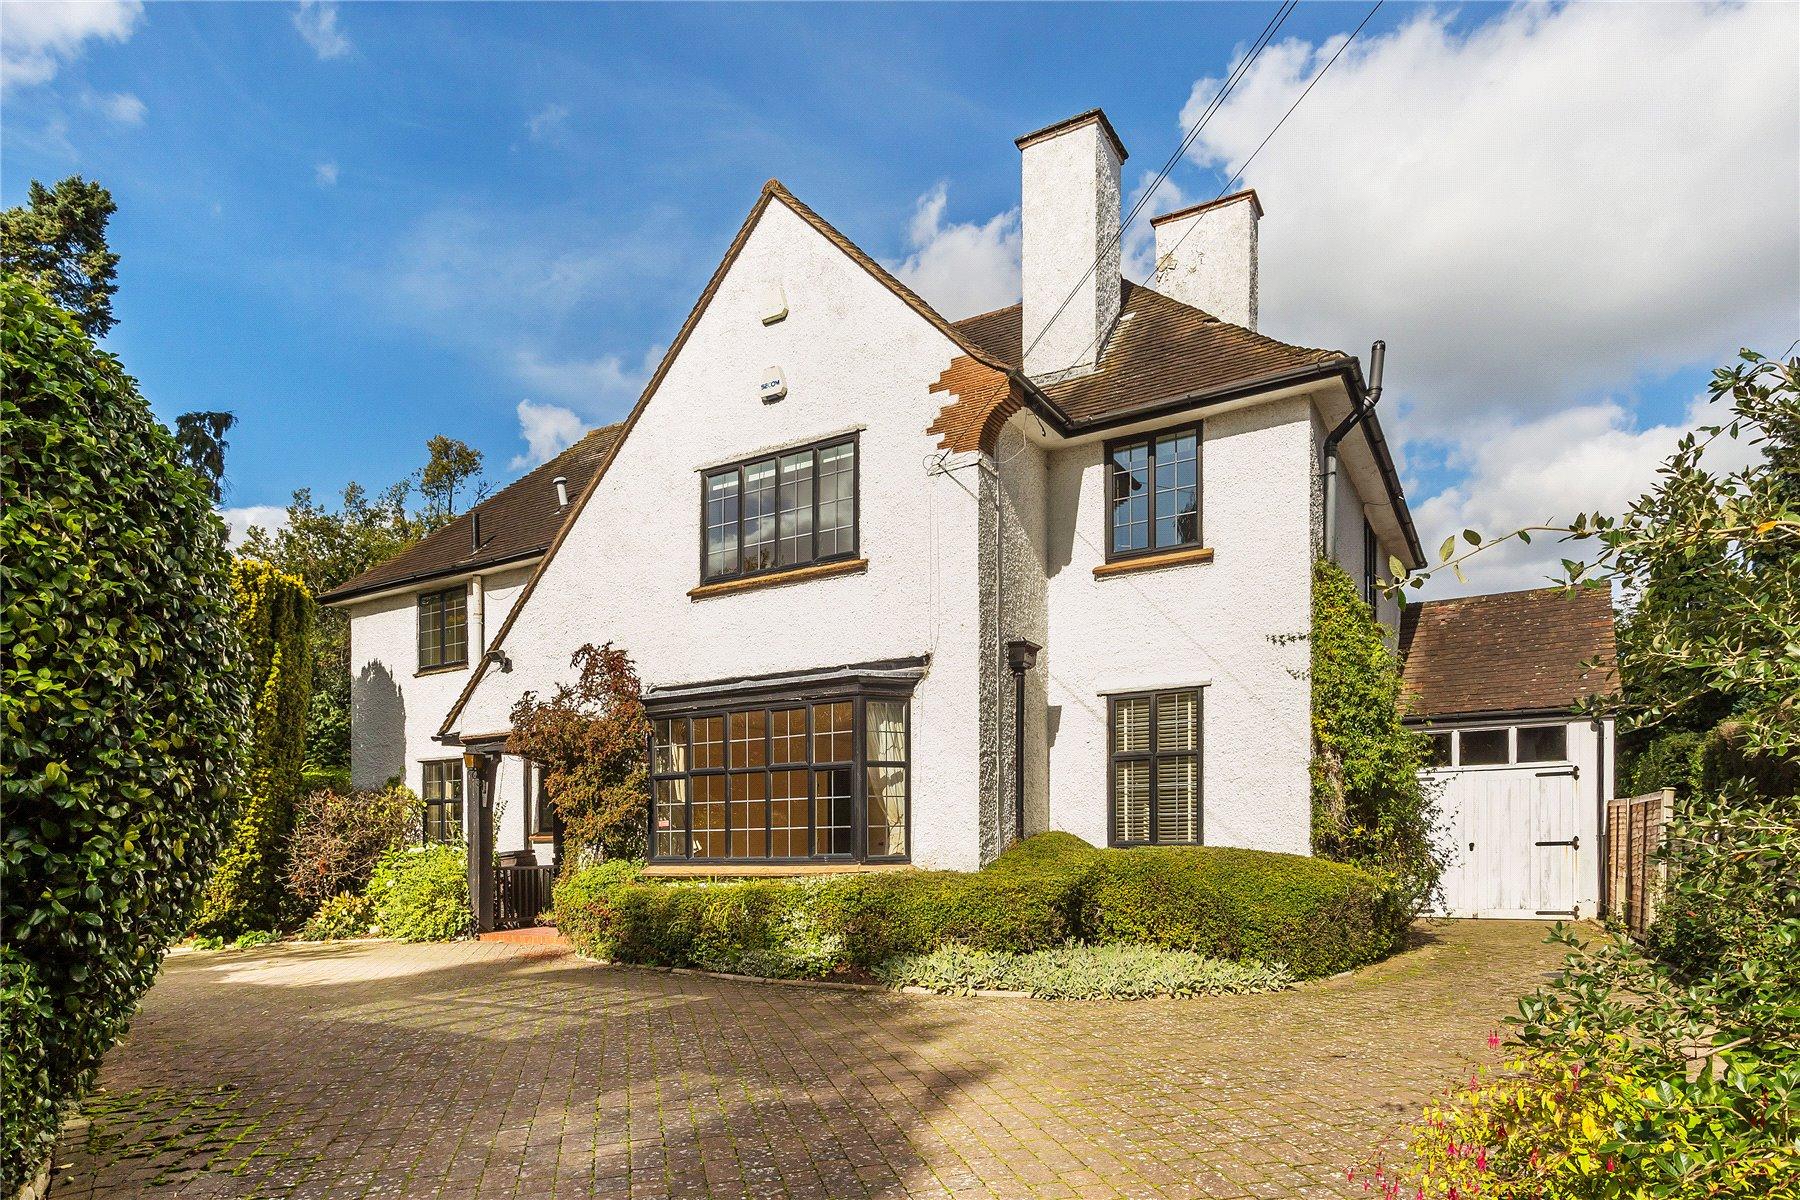 4 Bedrooms Detached House for sale in Ashwood Road, Woking, Surrey, GU22